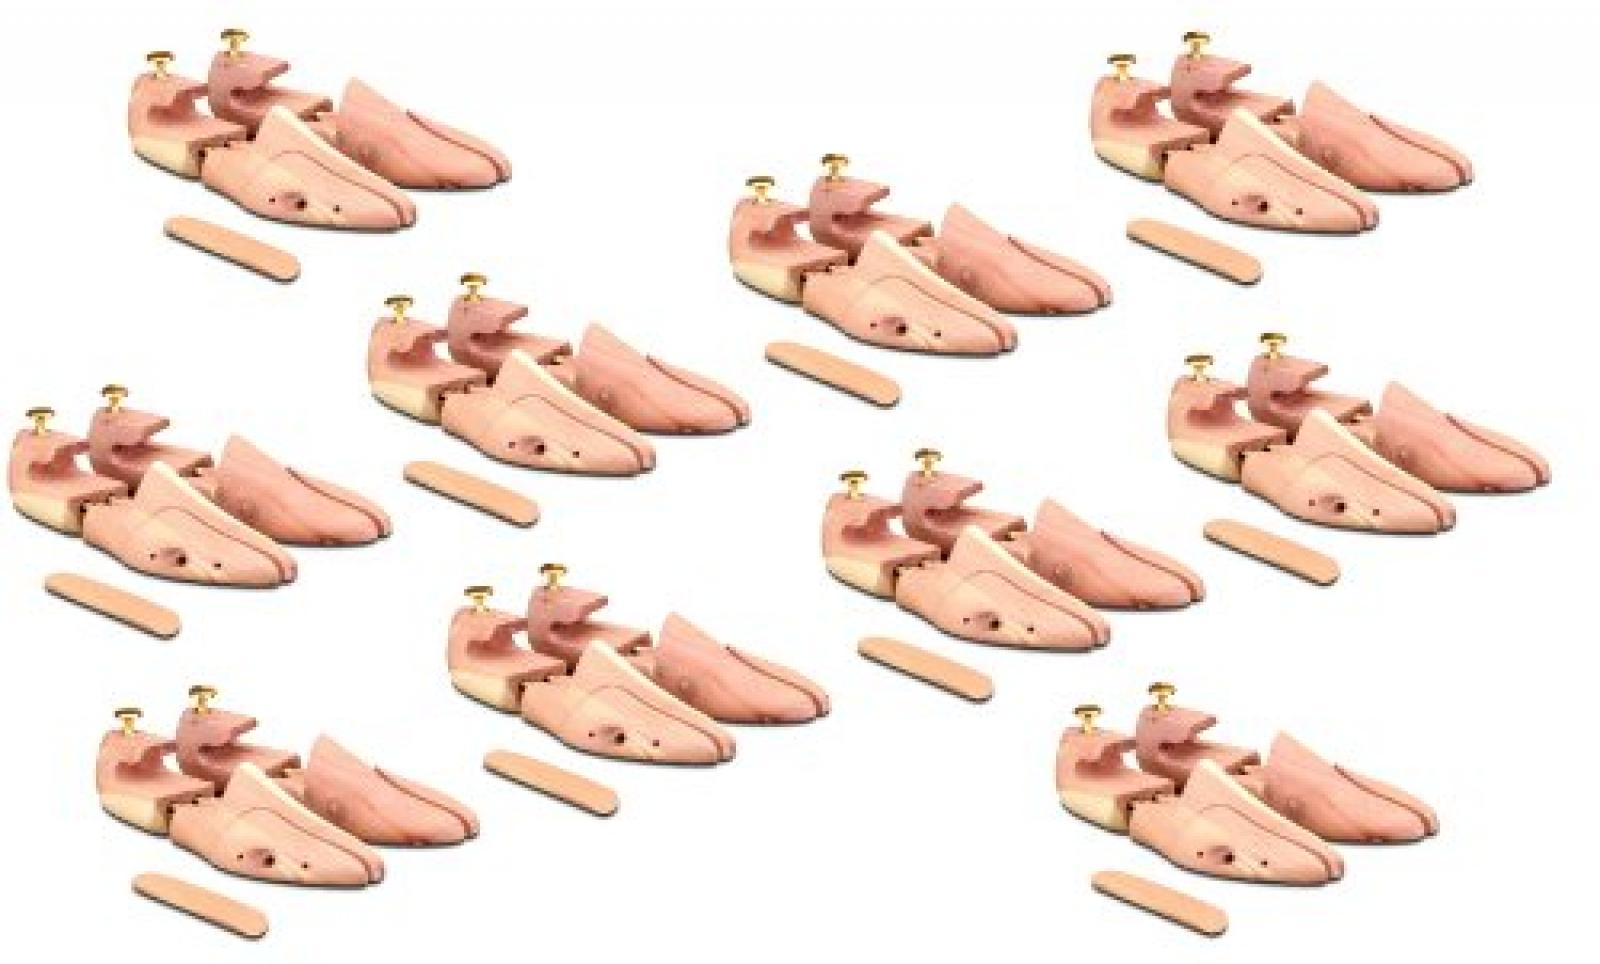 20 Paar Schuhspanner aus Zedernholz Langer & Messmer, das Original